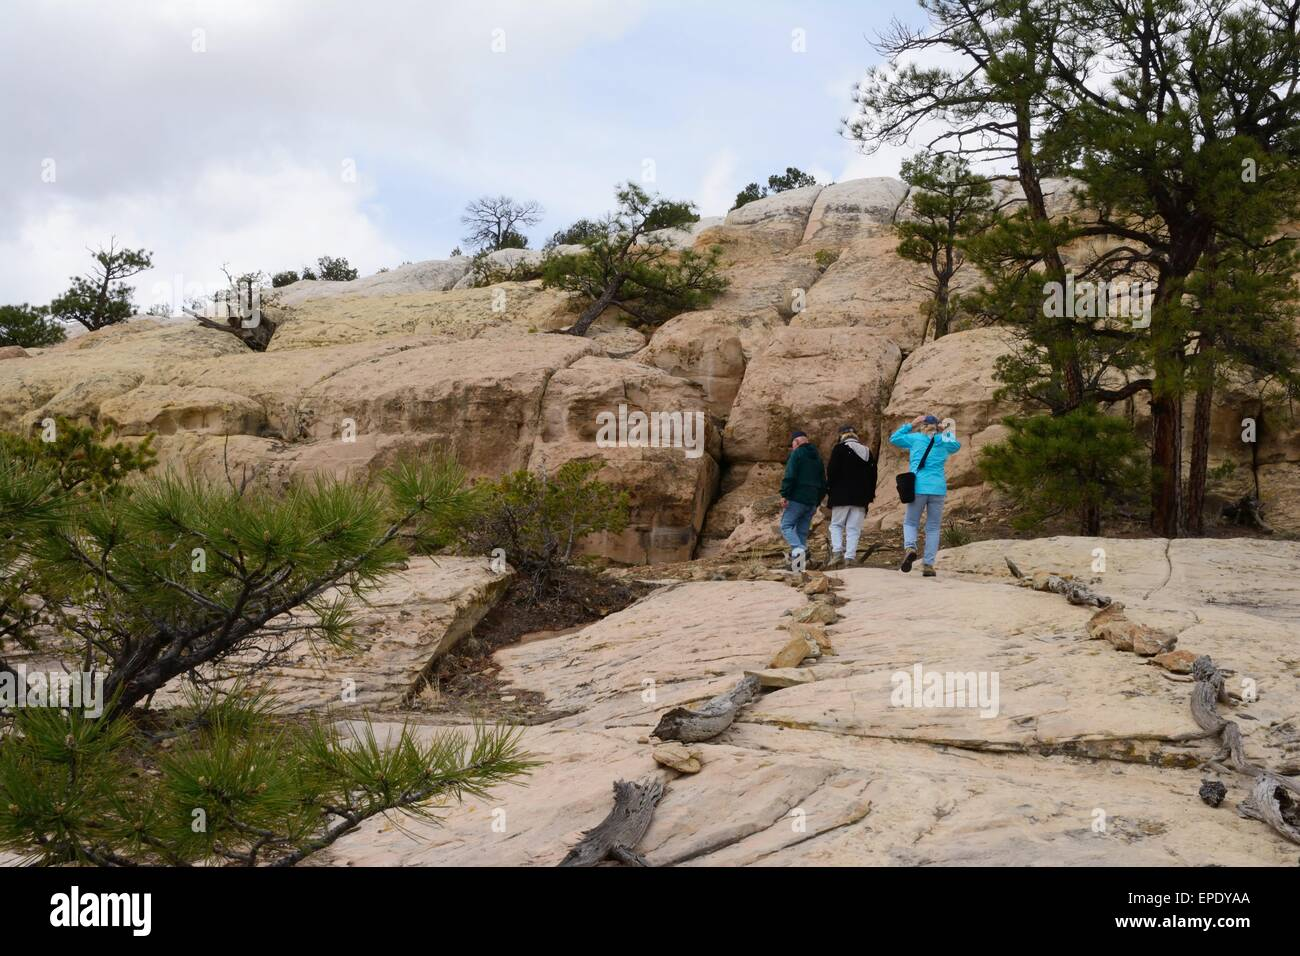 Three Seniors hiking sandstone trail at El Morro National Monument New Mexico - USA - Stock Image